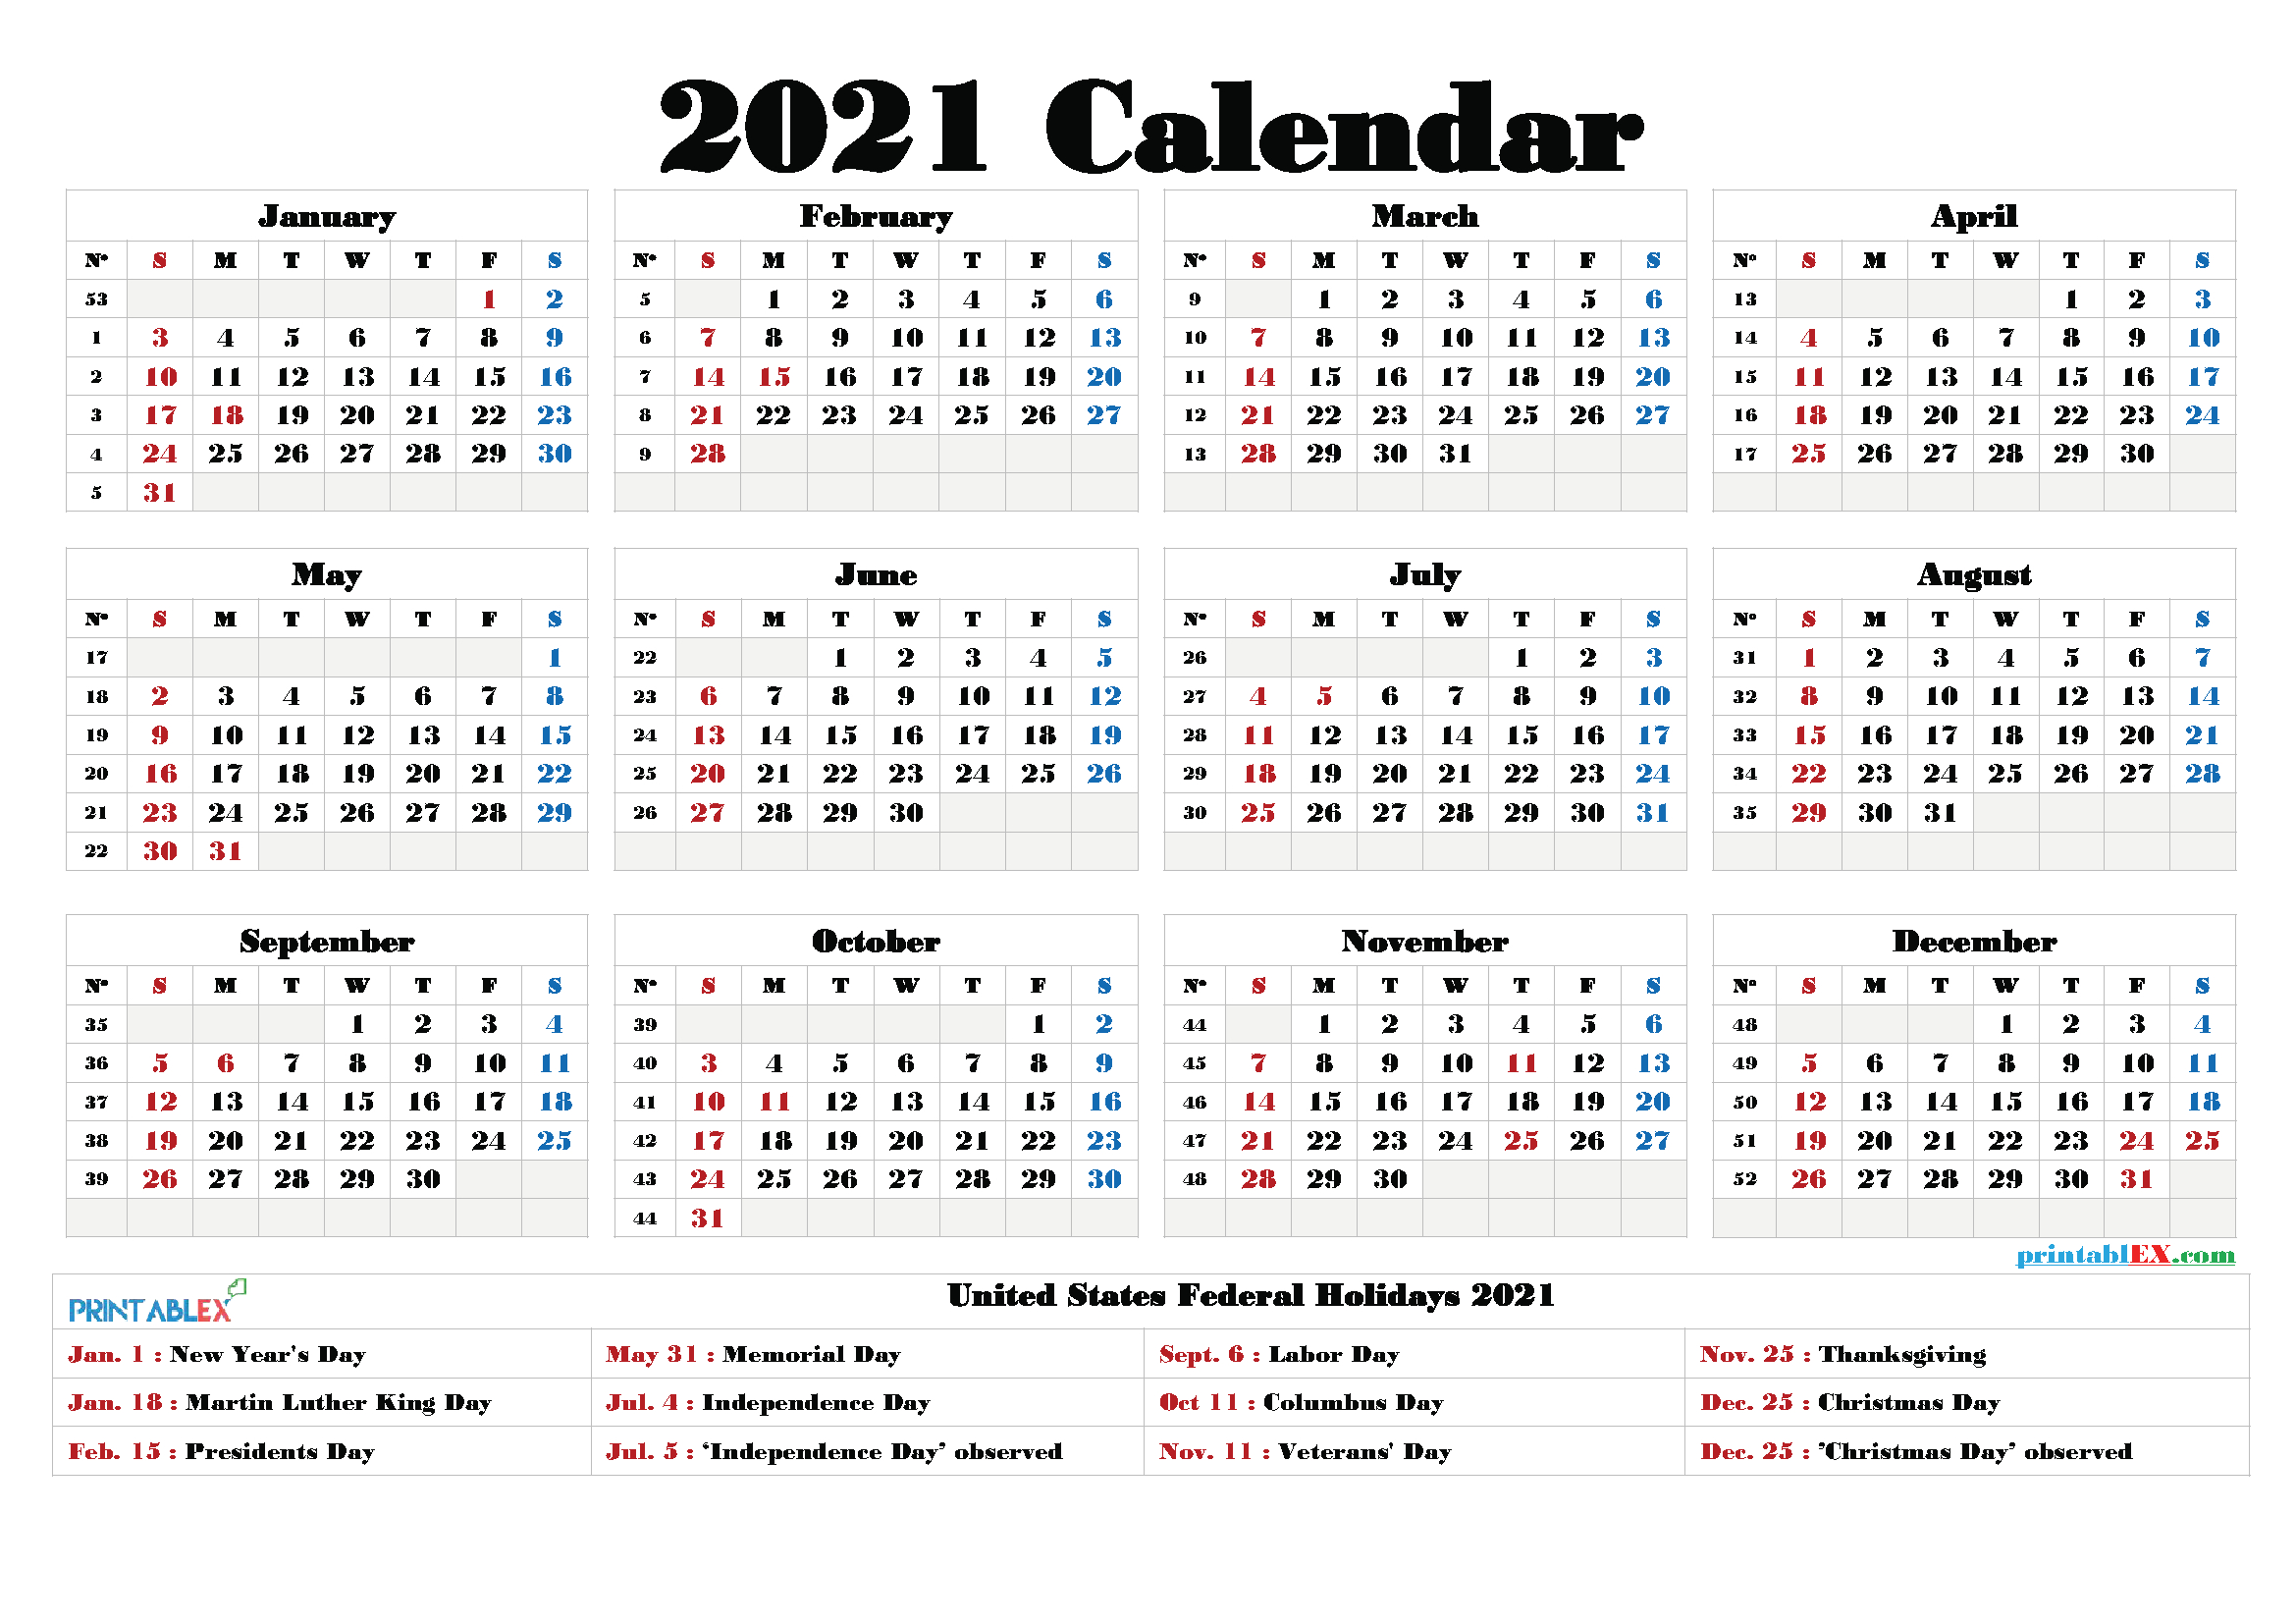 Free Printable Calendar 2021 regarding Federal Government Calendar 2021 Printable